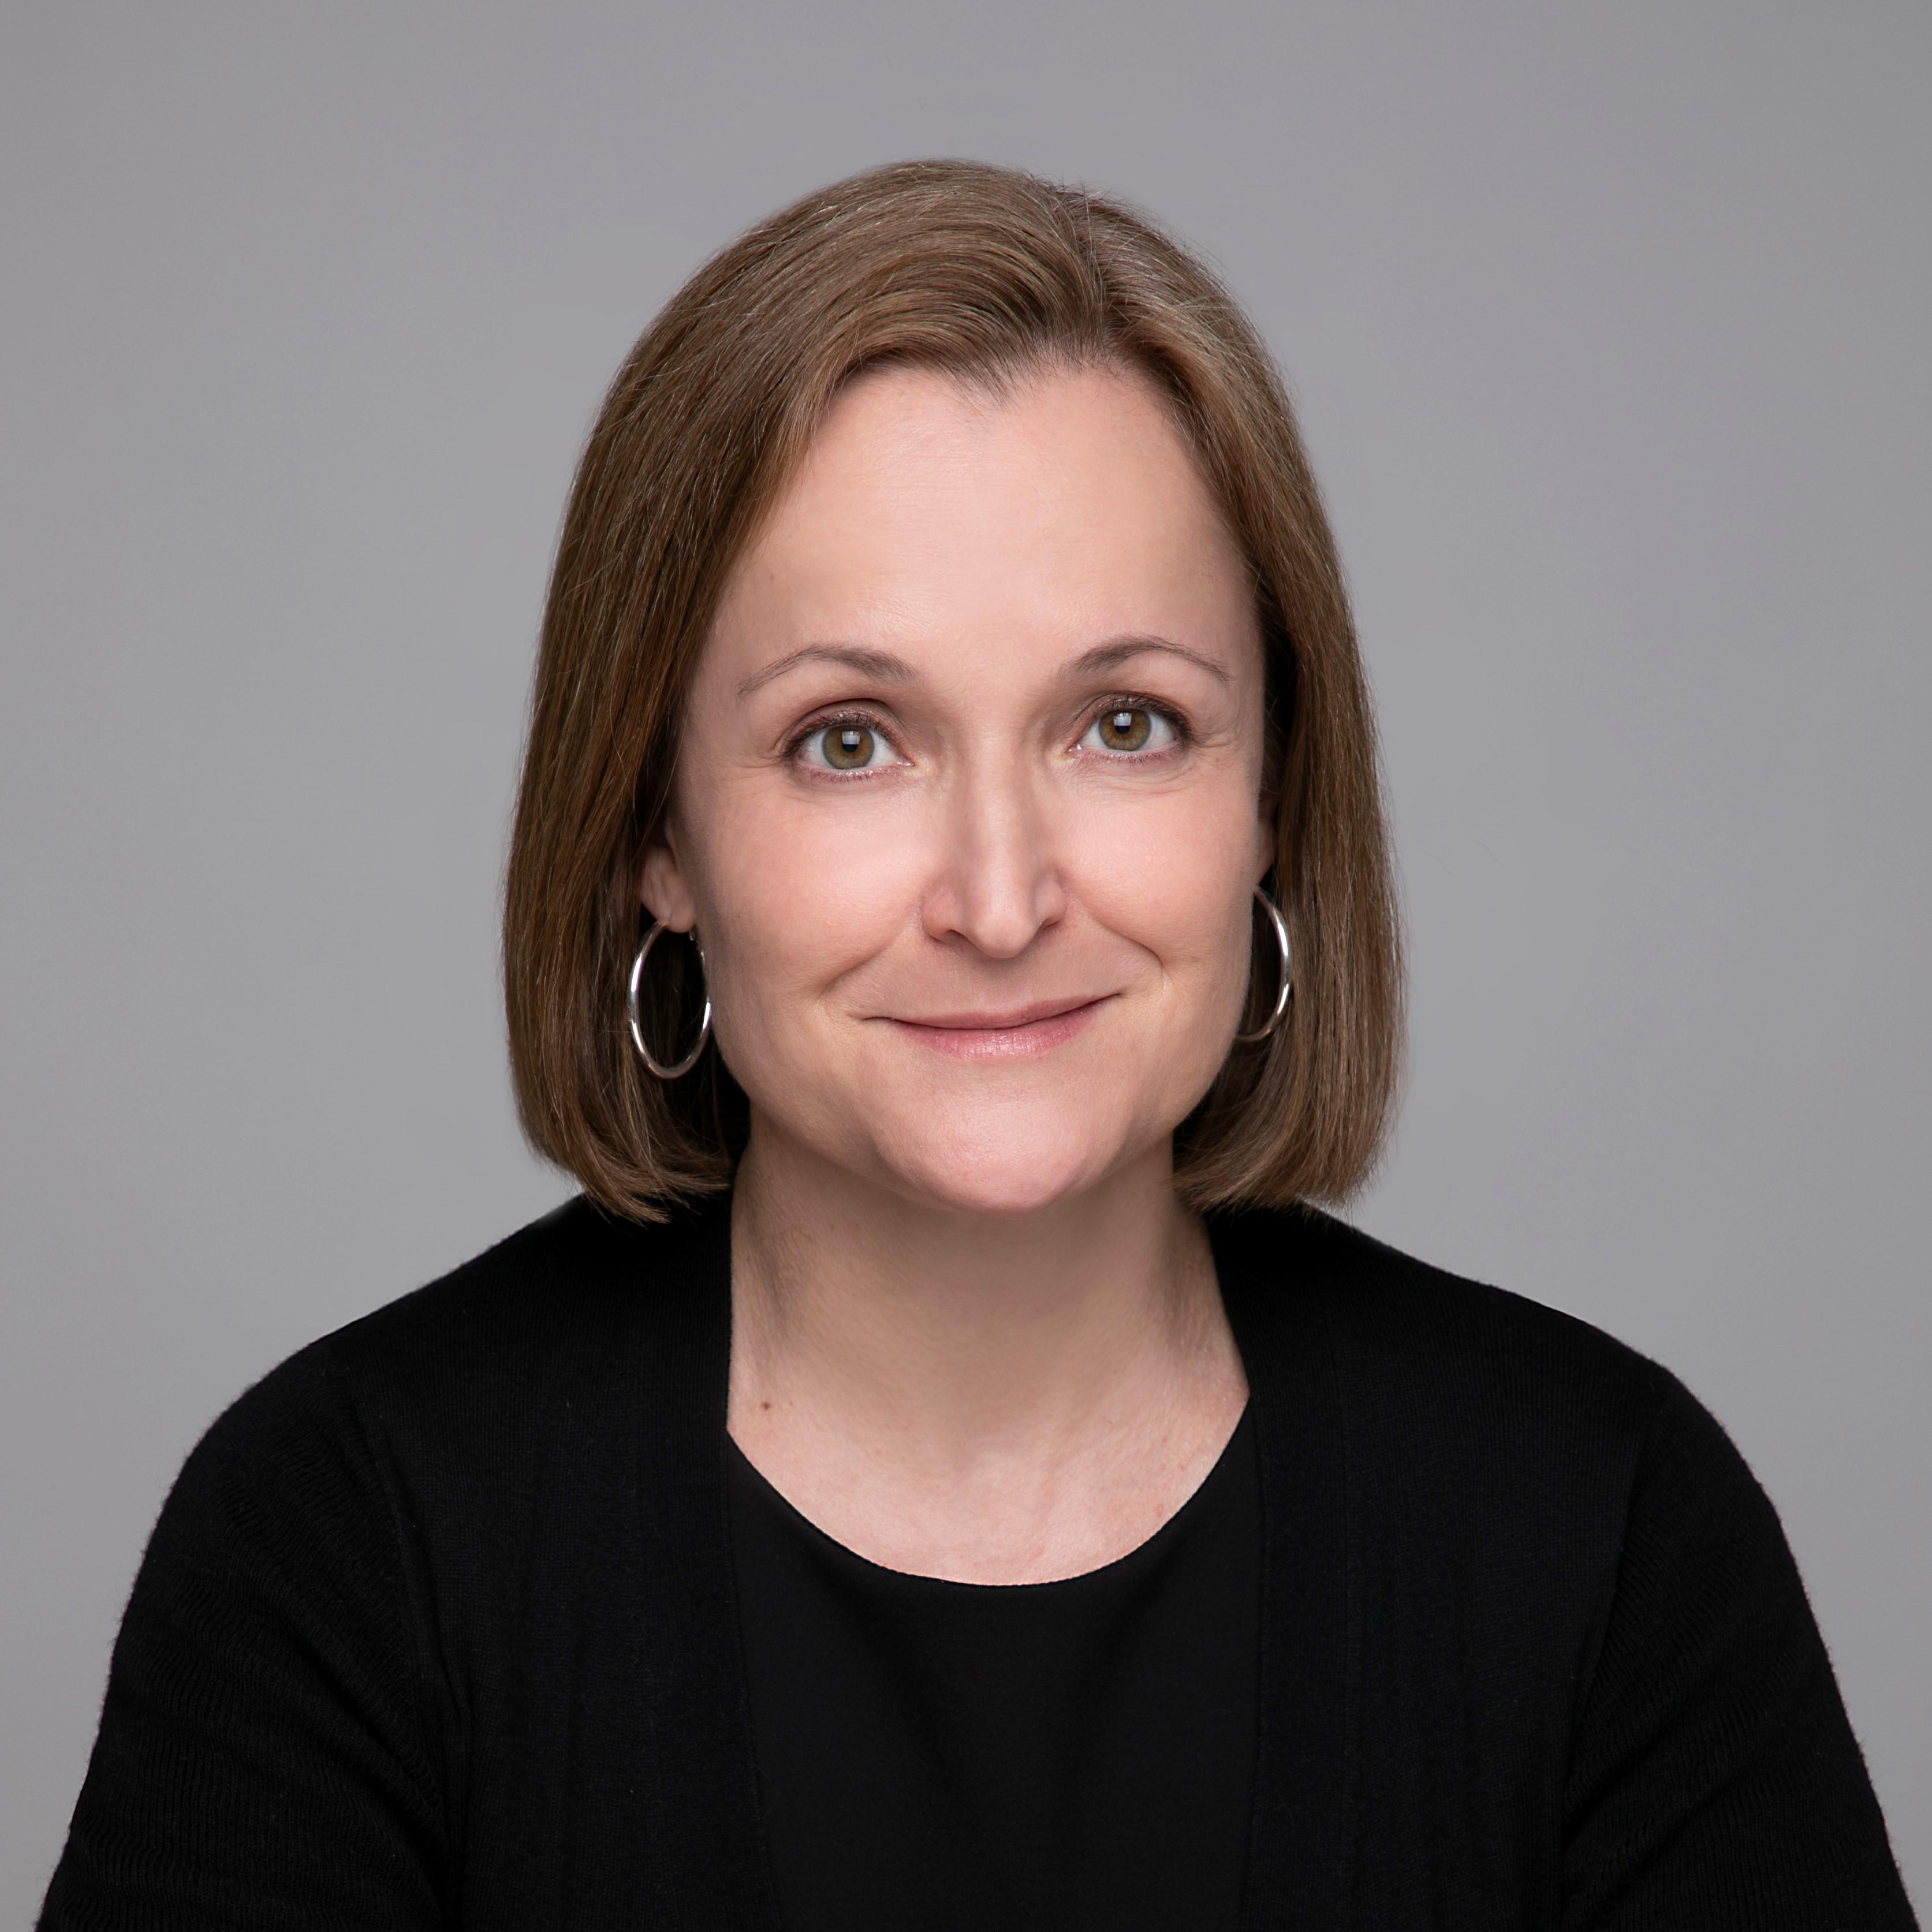 Kirsten Hytopoulous